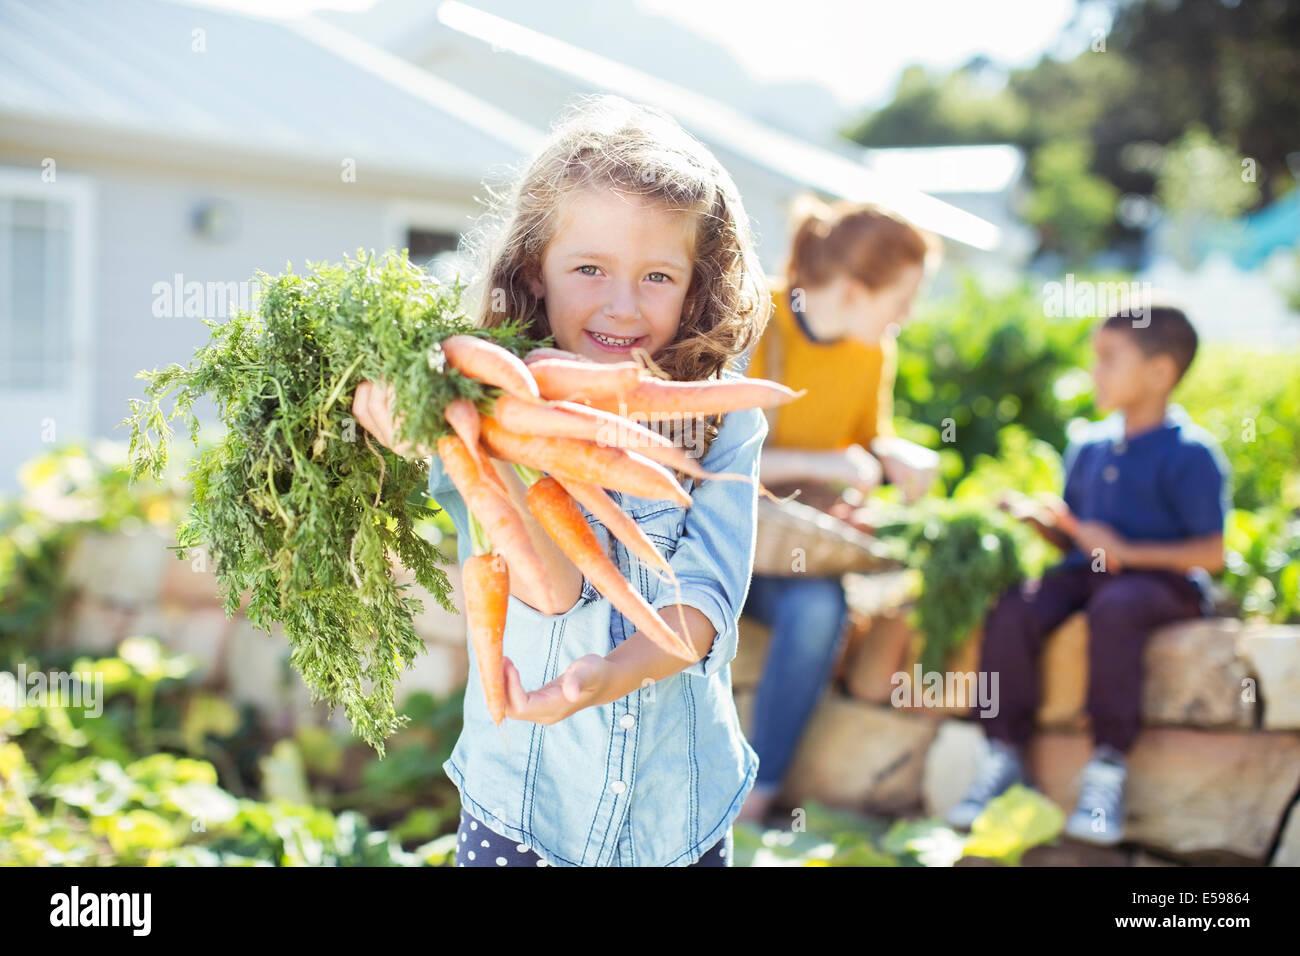 Girl holding bunch of carrots in garden Photo Stock